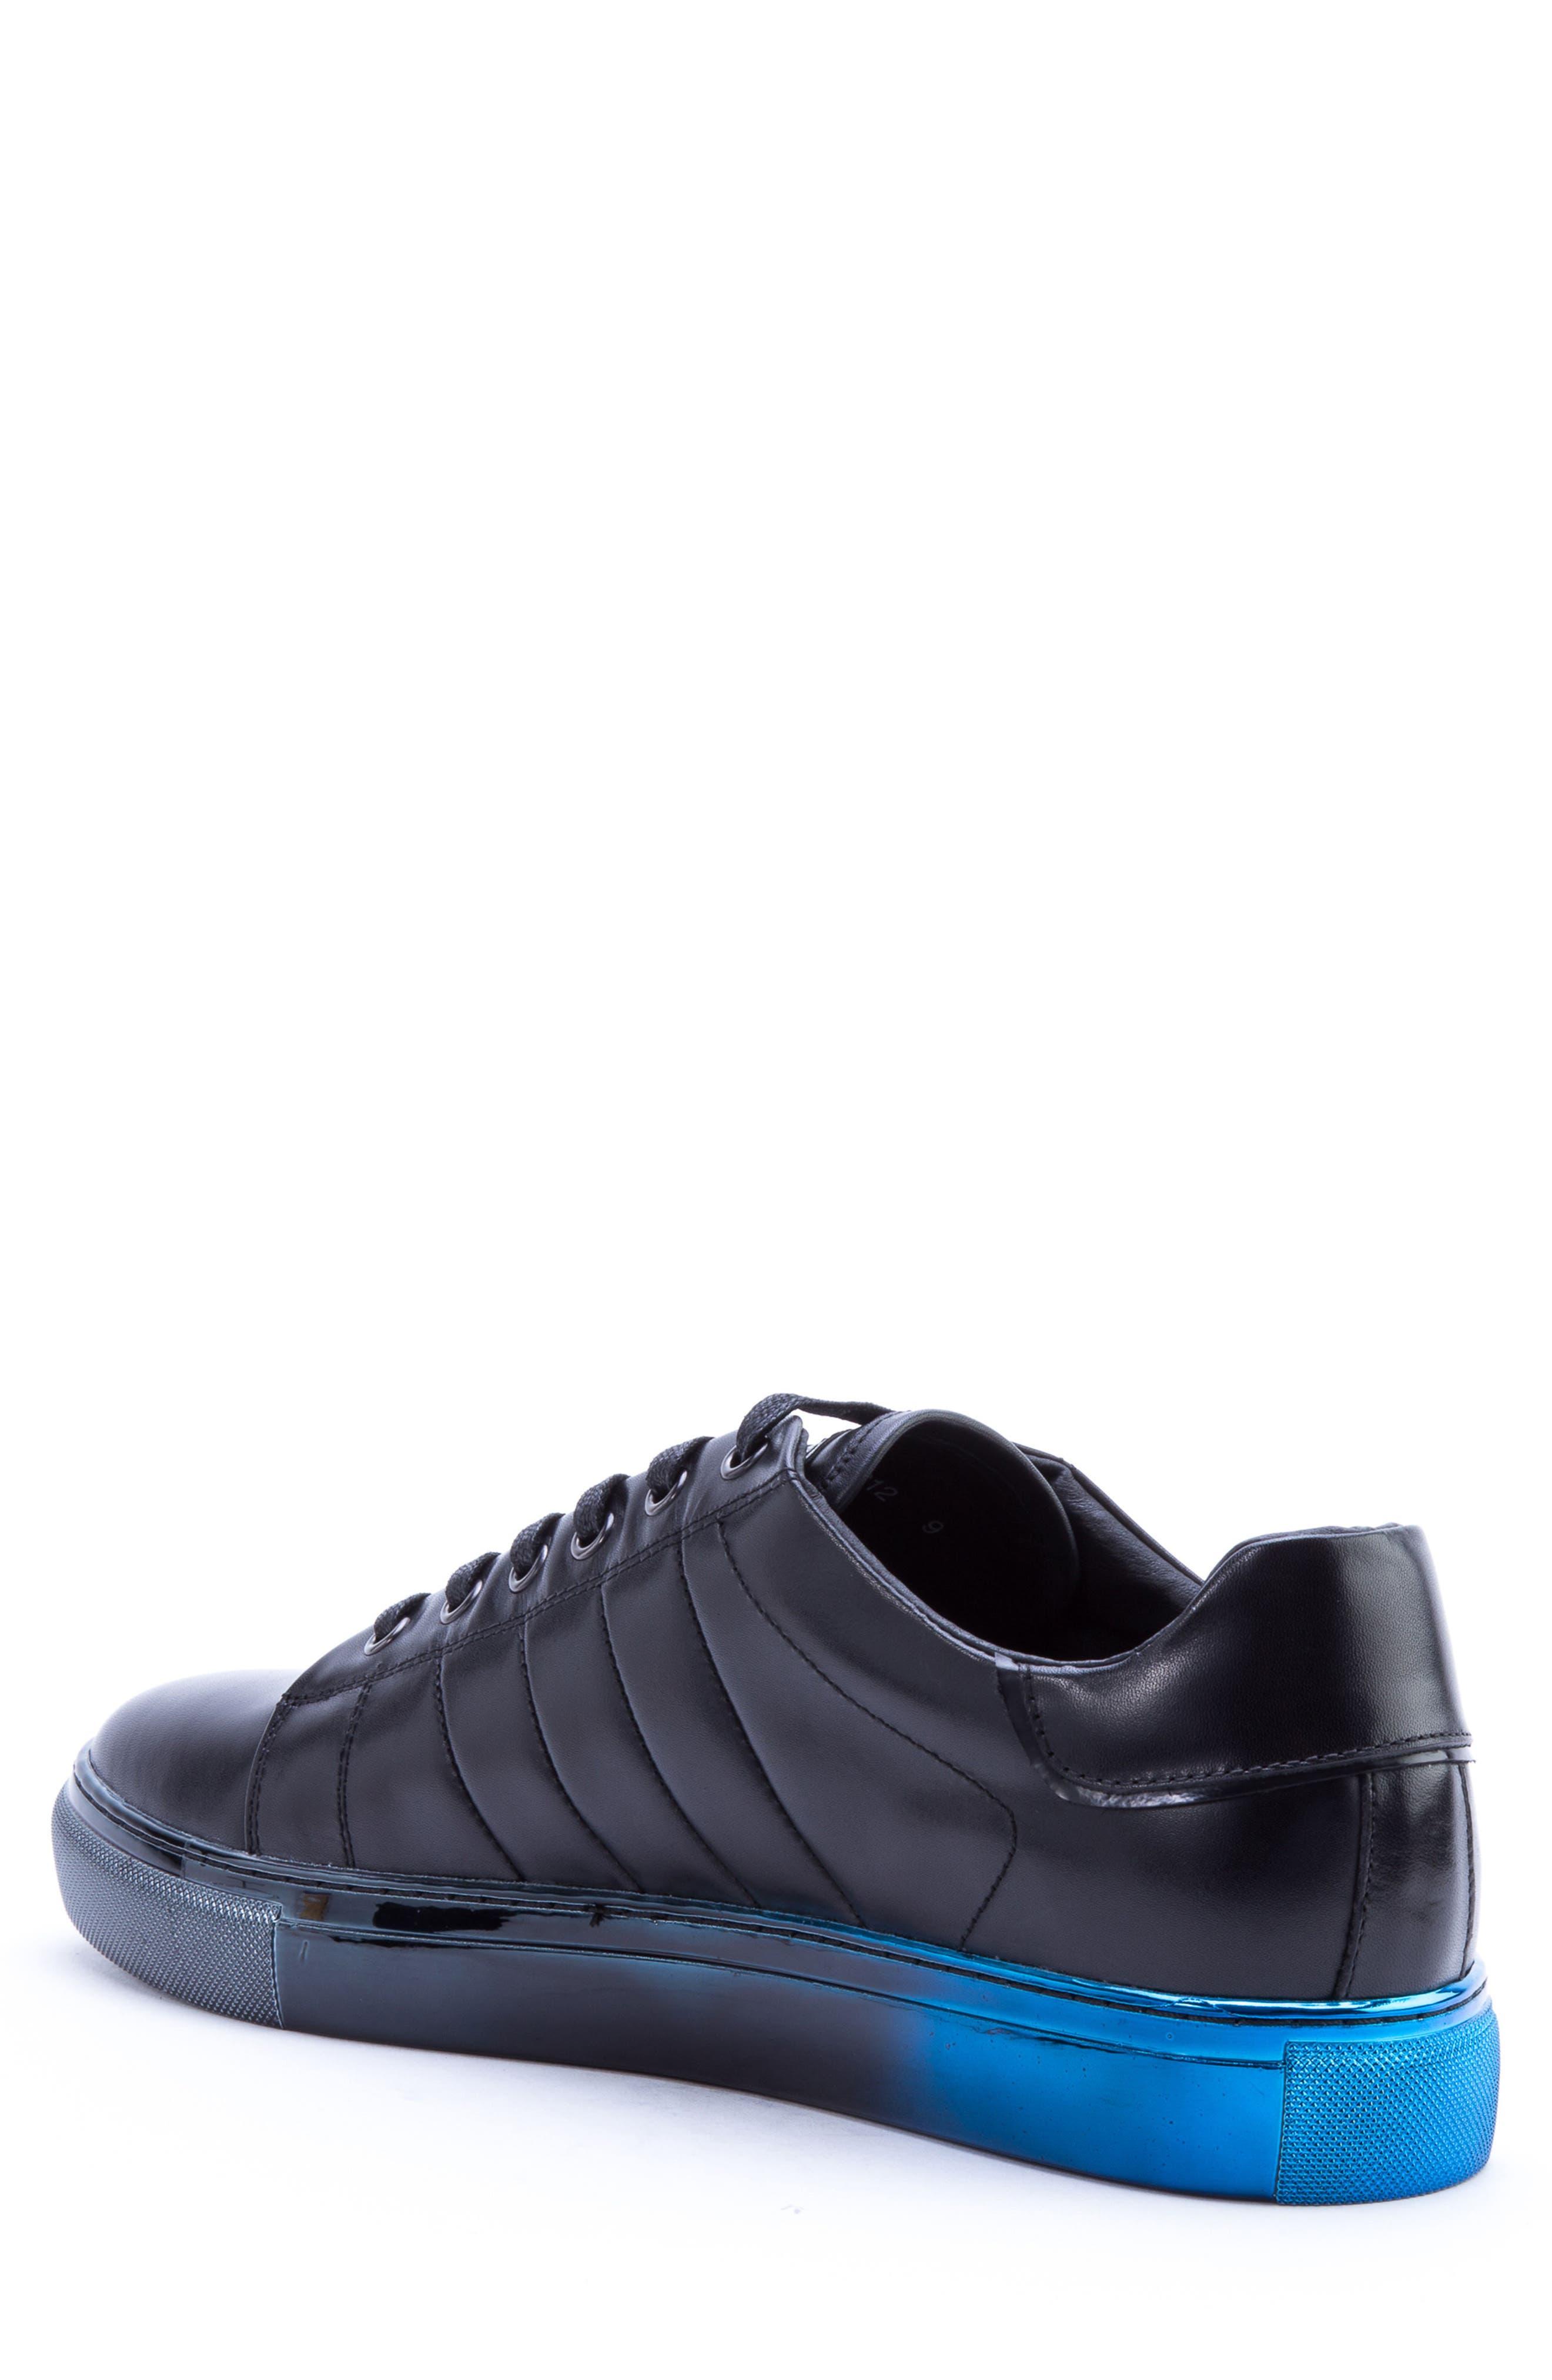 BADGLEY MISCHKA COLLECTION, Badgley Mischka Brando Sneaker, Alternate thumbnail 2, color, BLACK LEATHER